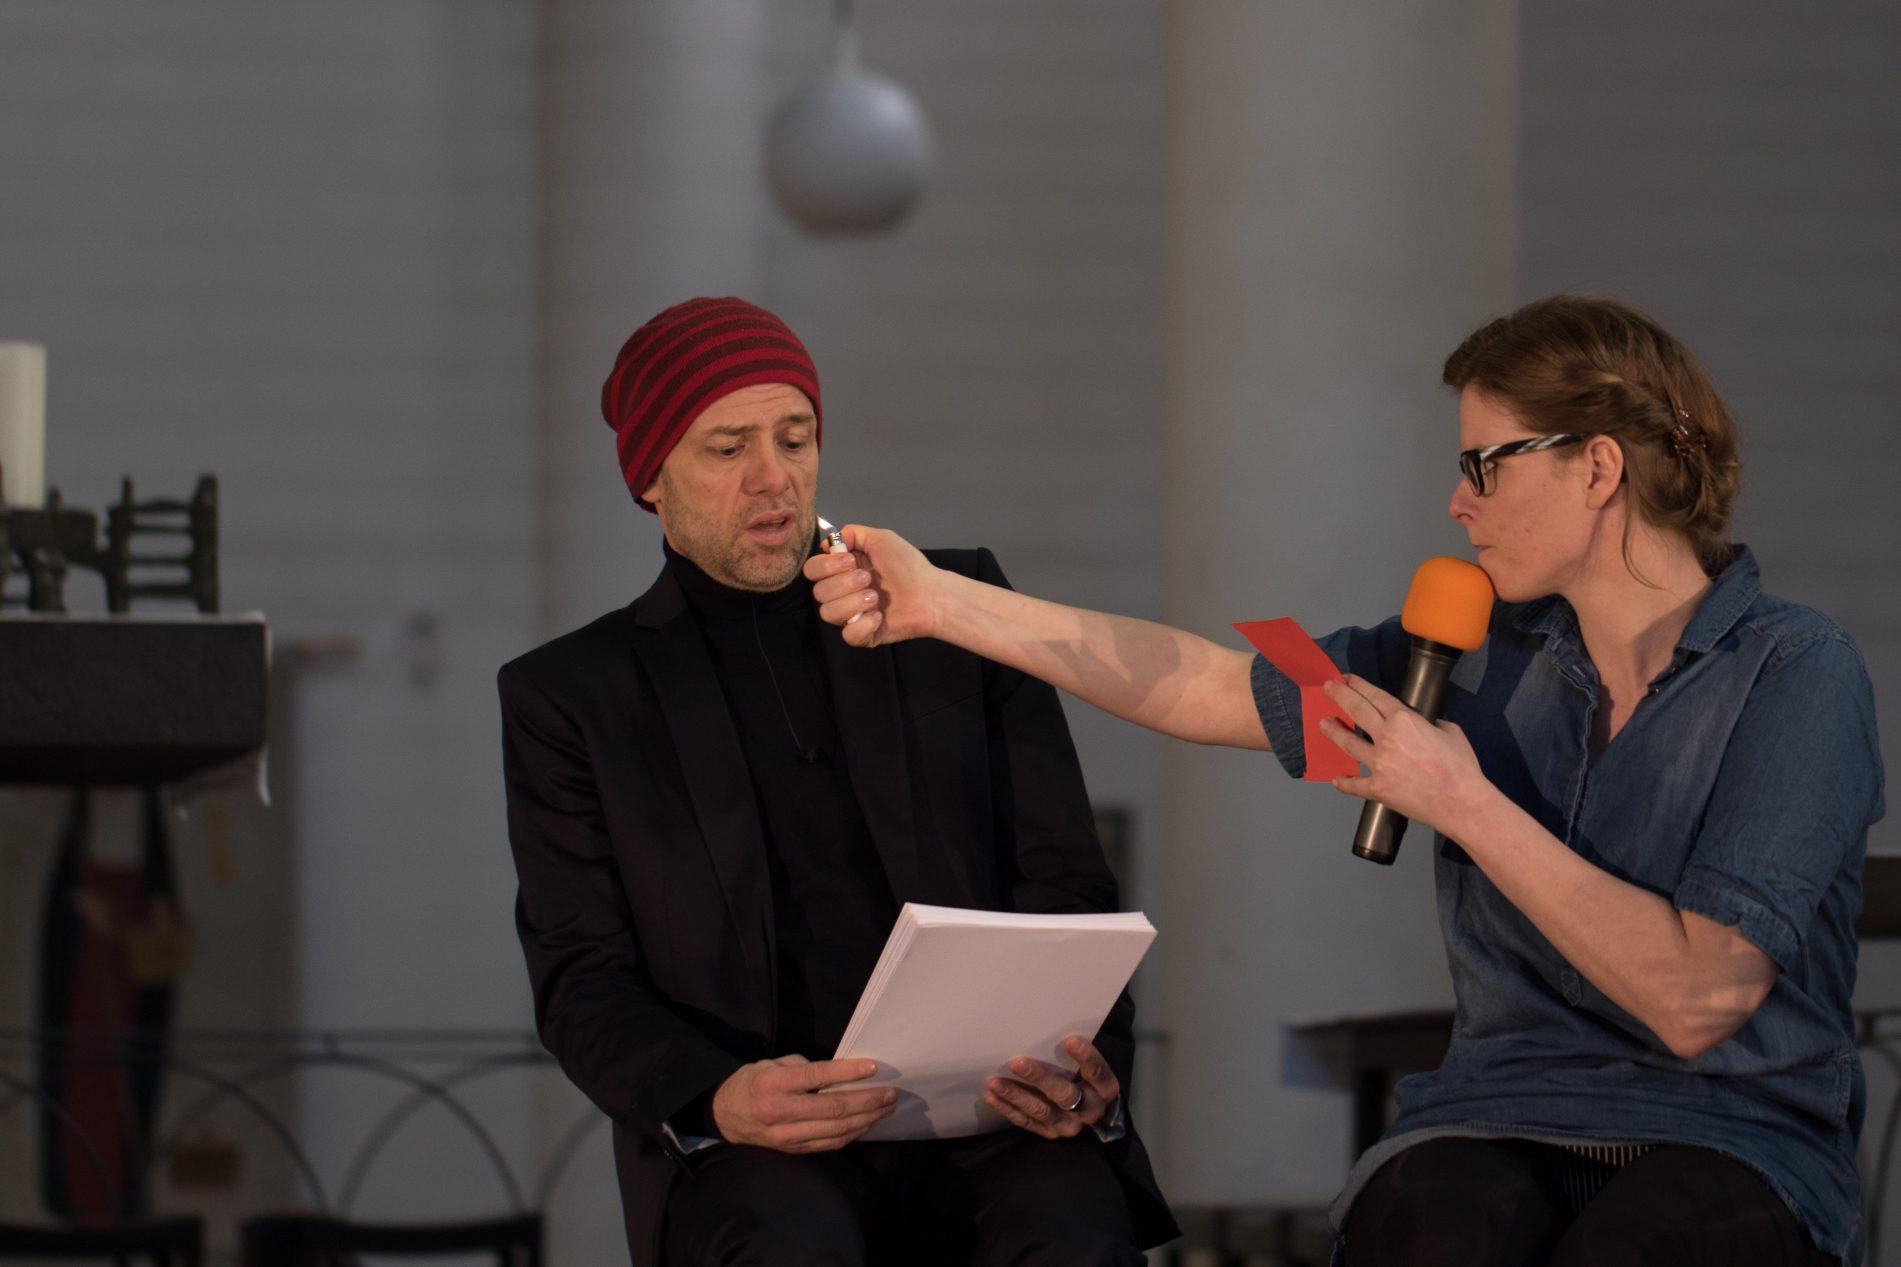 2016 | Oskar und die Dame in Rosa | Theater oder so | Oskar